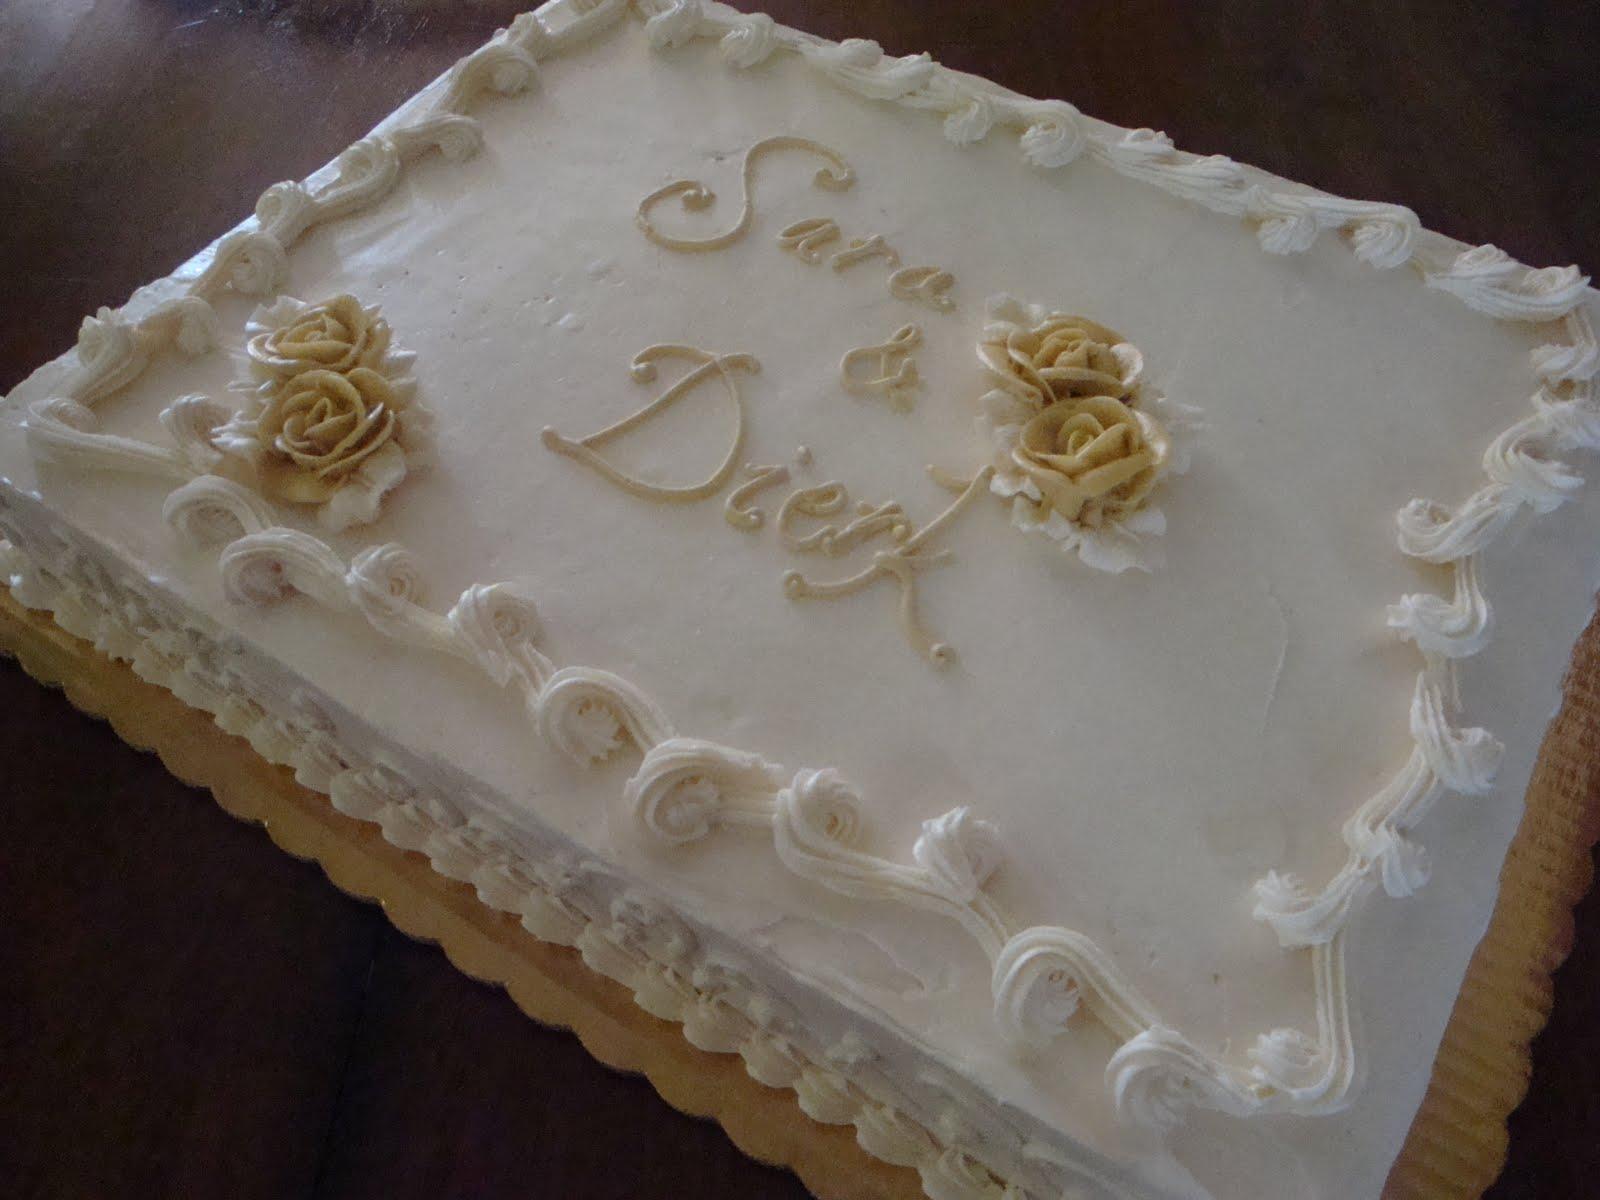 The Jaded Spoon Saras Wedding Cakes